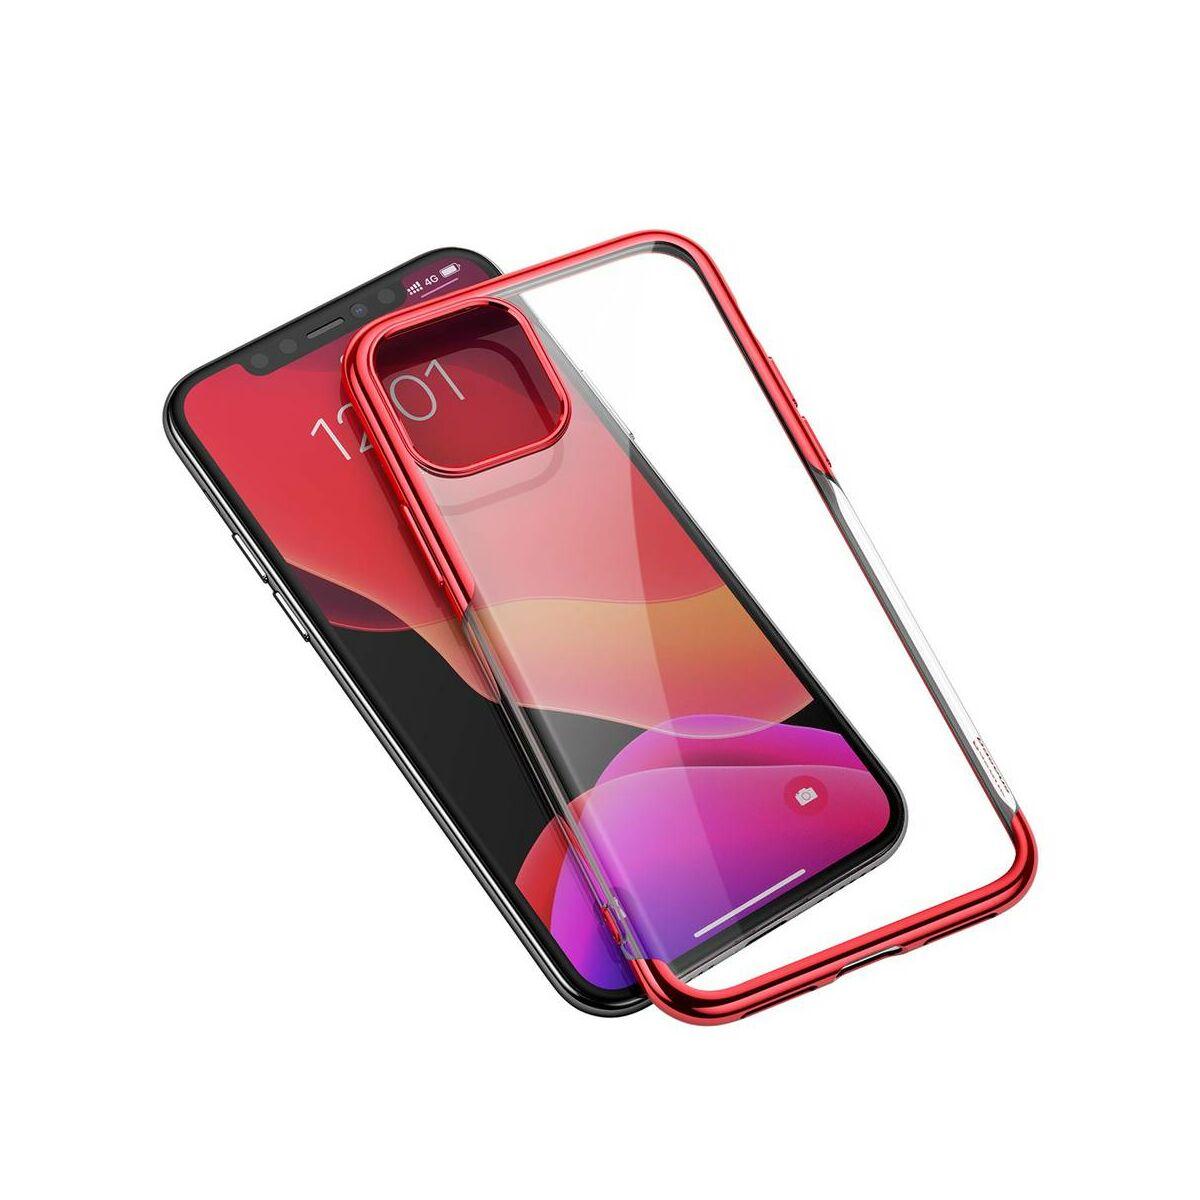 Baseus iPhone 11 Pro Max tok, Shining, piros (ARAPIPH65S-MD09)